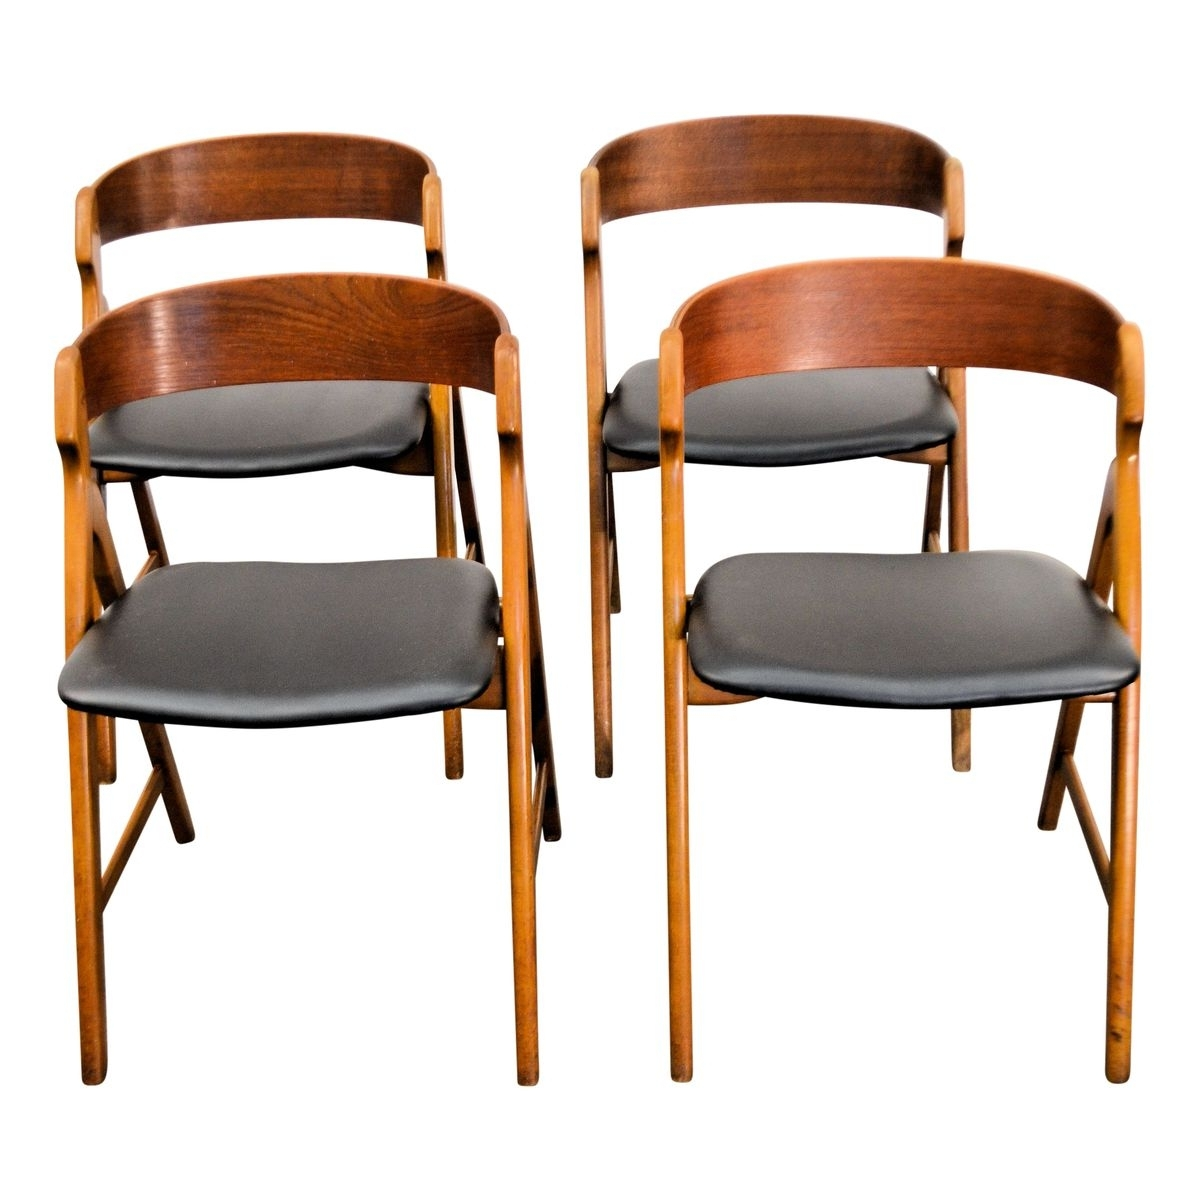 Vintage Wooden Dining Chairshenning Kjaernulf For Boltinge Støle intended for Most Recently Released Wooden Dining Sets